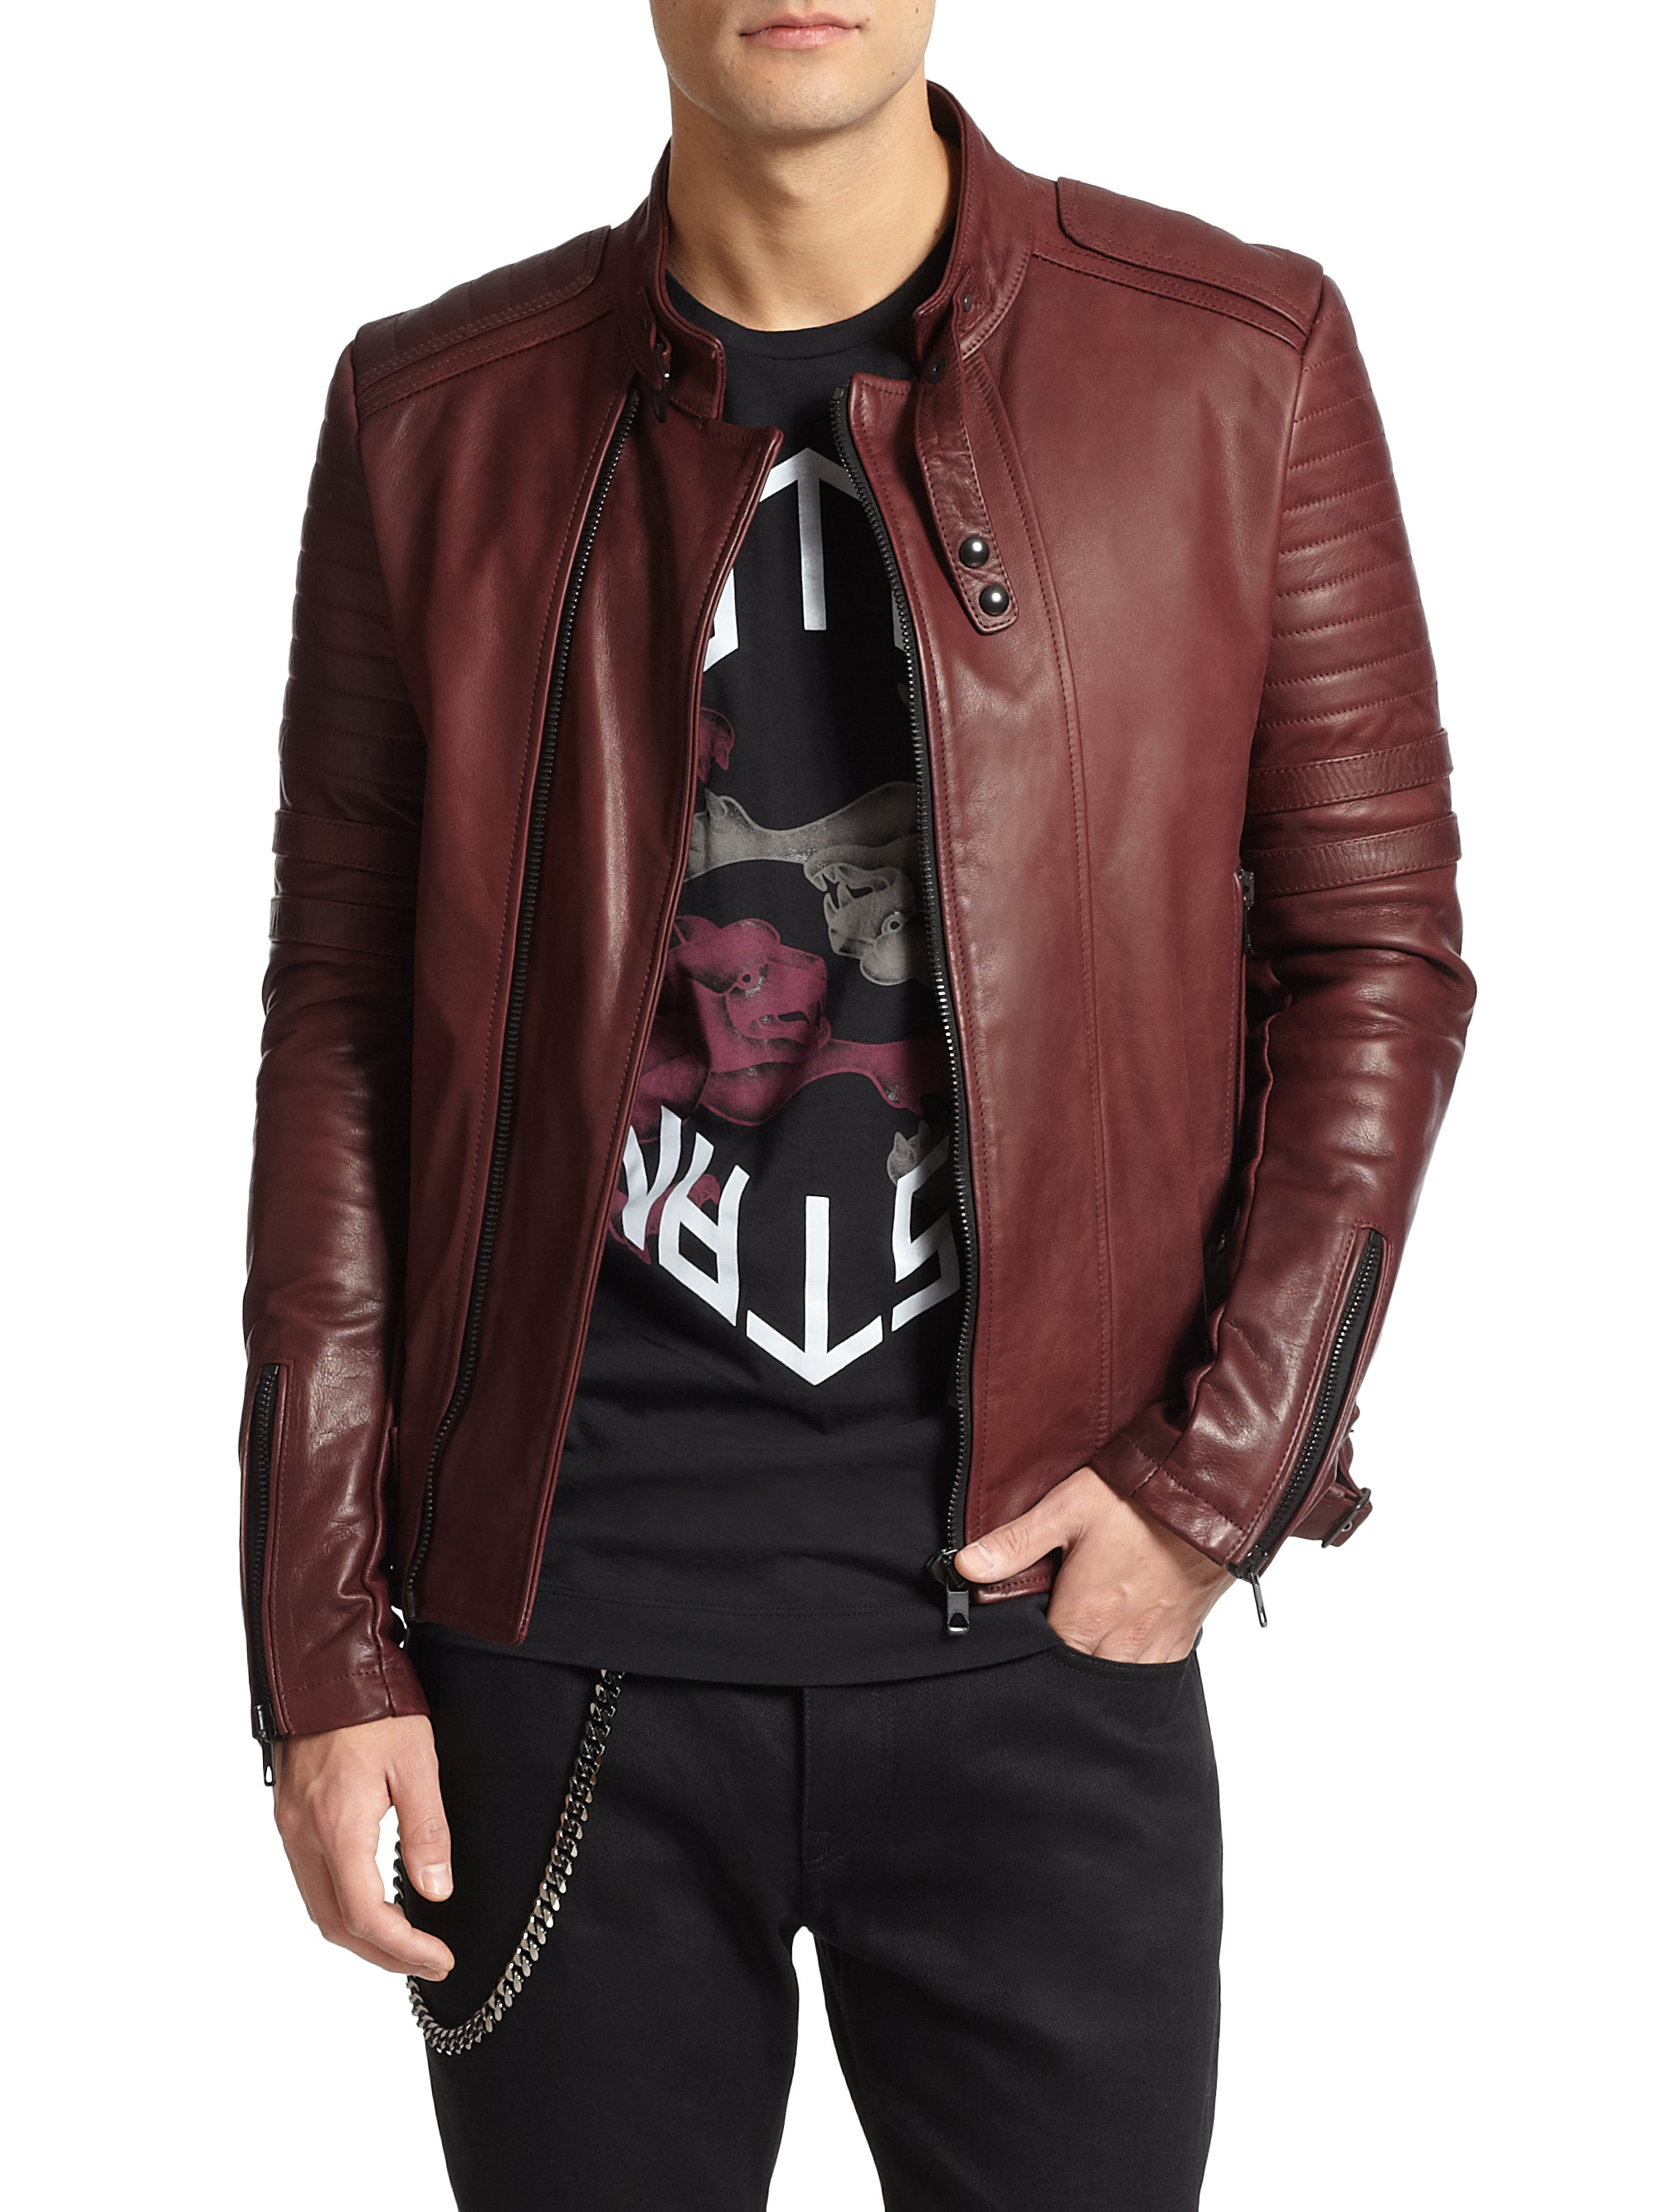 Diesel Black Gold Leather Biker Jacket In Bordeaux Red